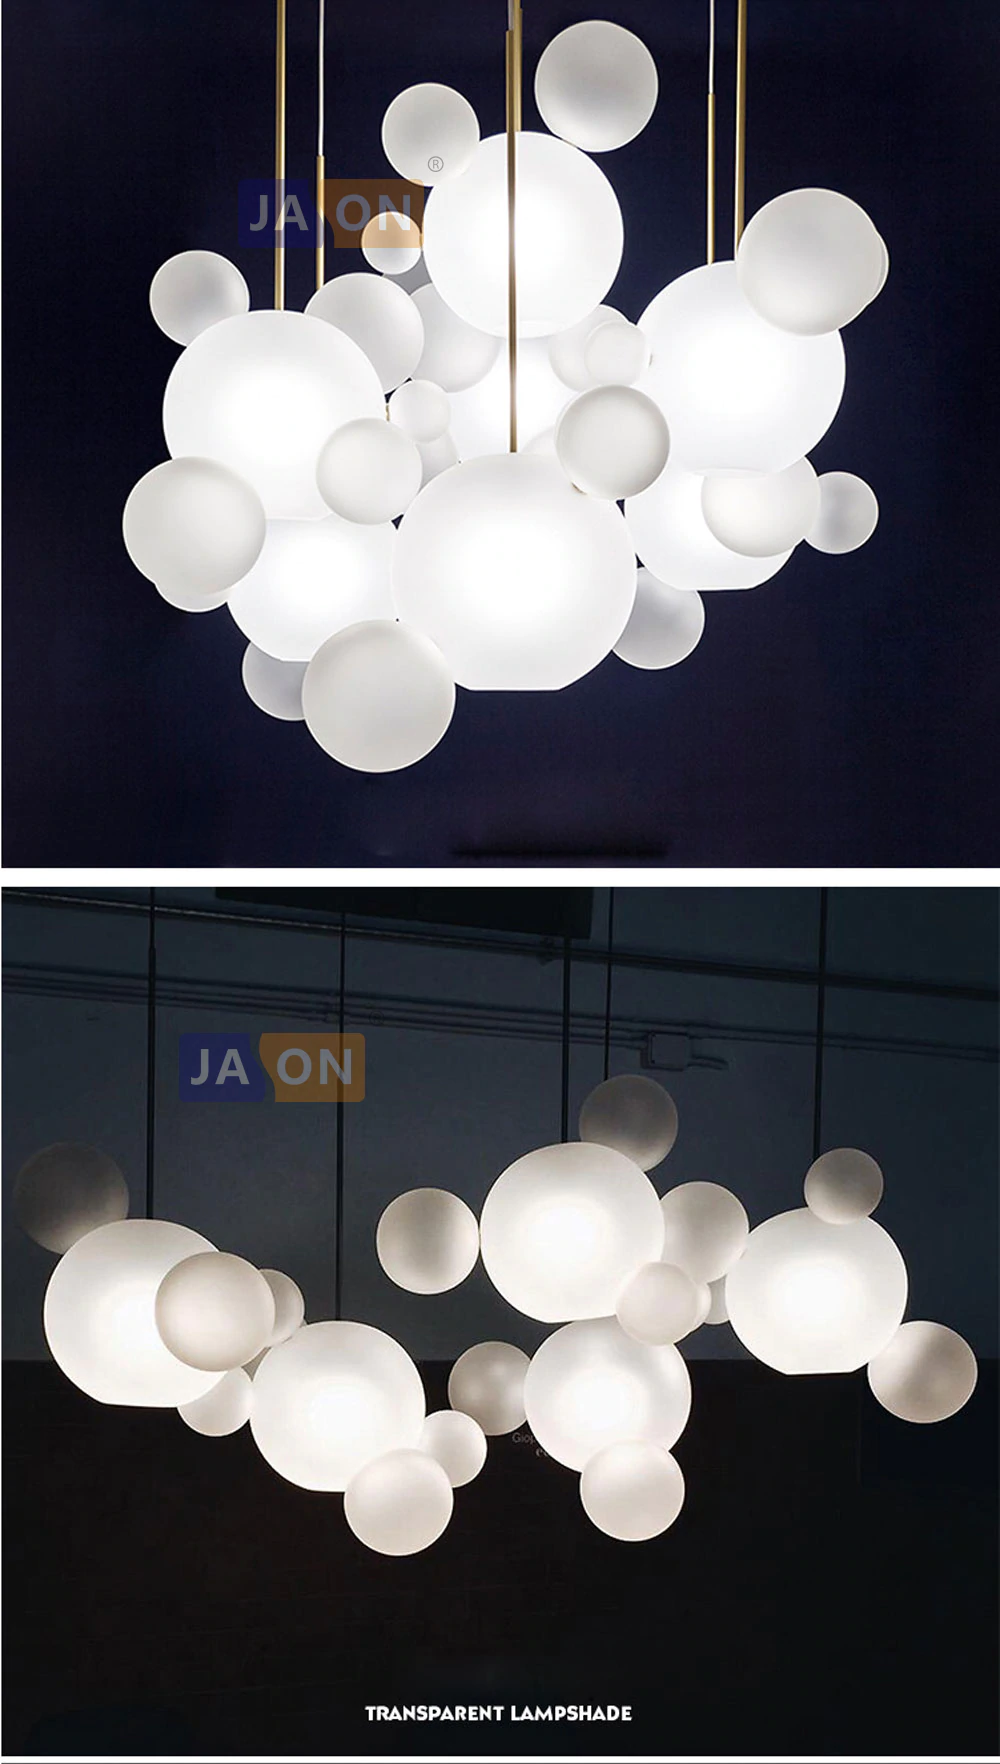 Led Nordic Eisen Glas Weiss Blase Designer Led Lampe Led Licht Anhanger Lichter Anhanger Lampe Anhanger Licht Fur Foyer I Led Lampe Anhanger Lampen Led Licht